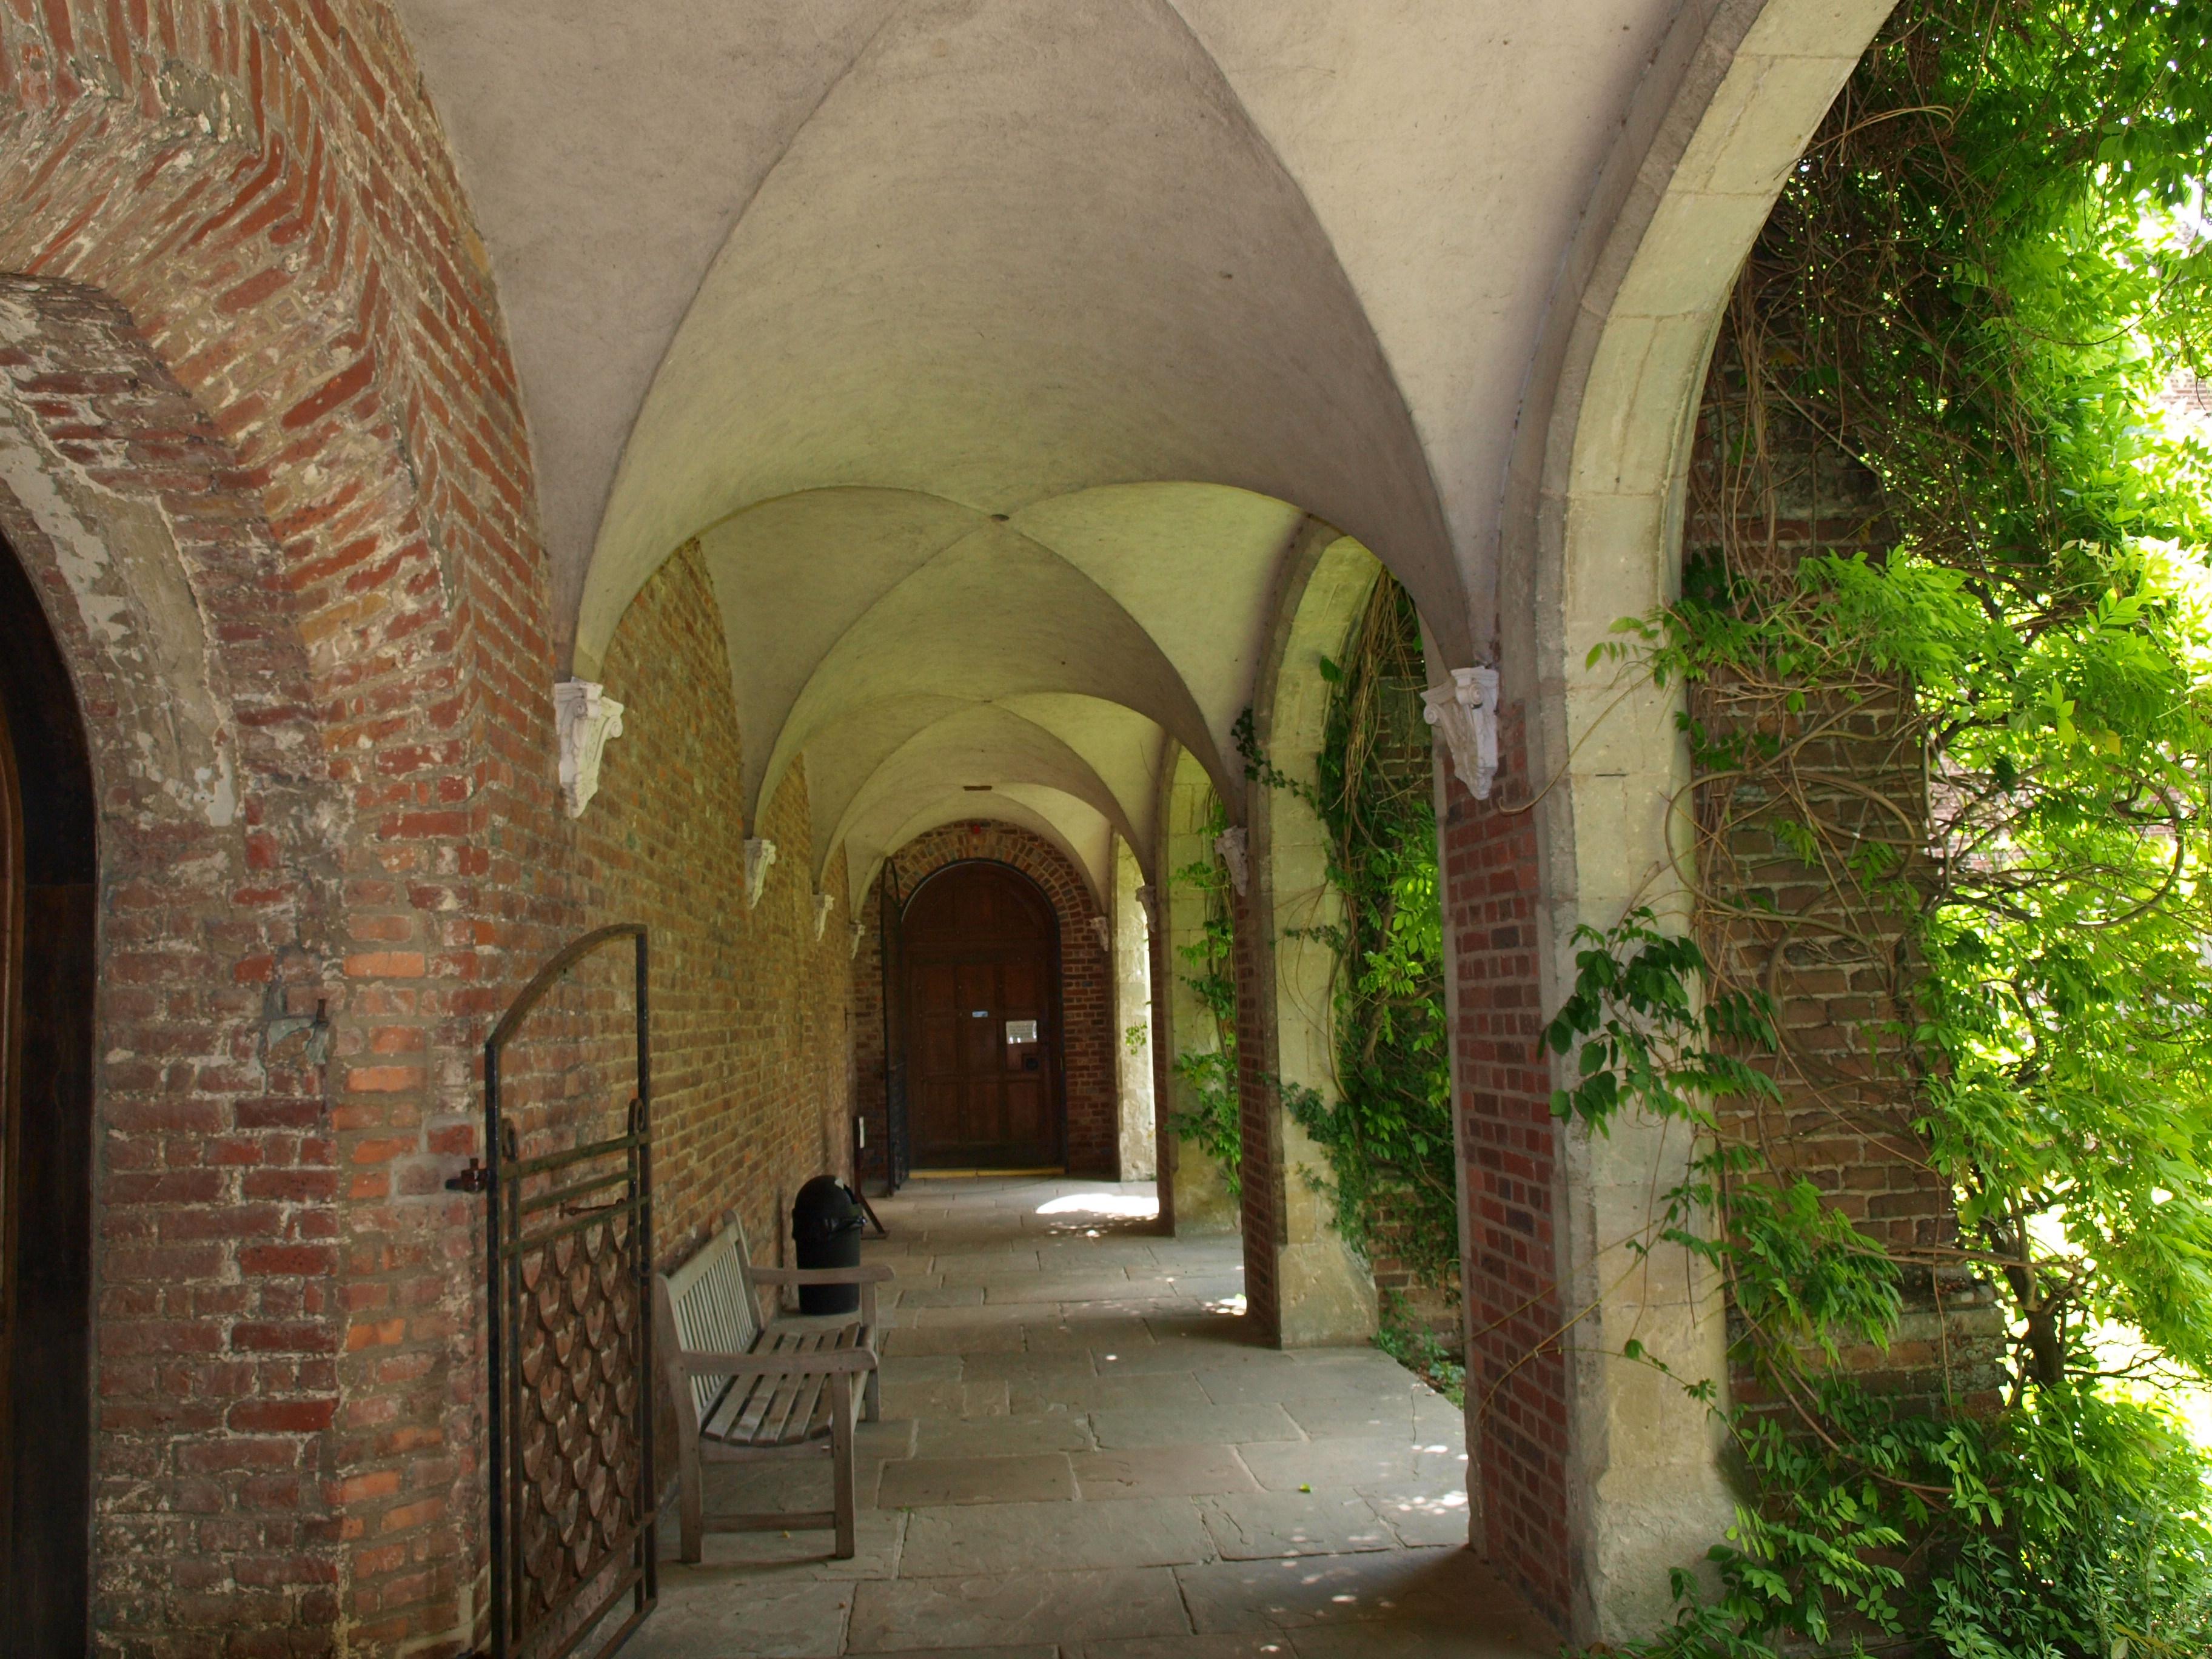 file:herstmonceux castle interior corridor - wikimedia commons